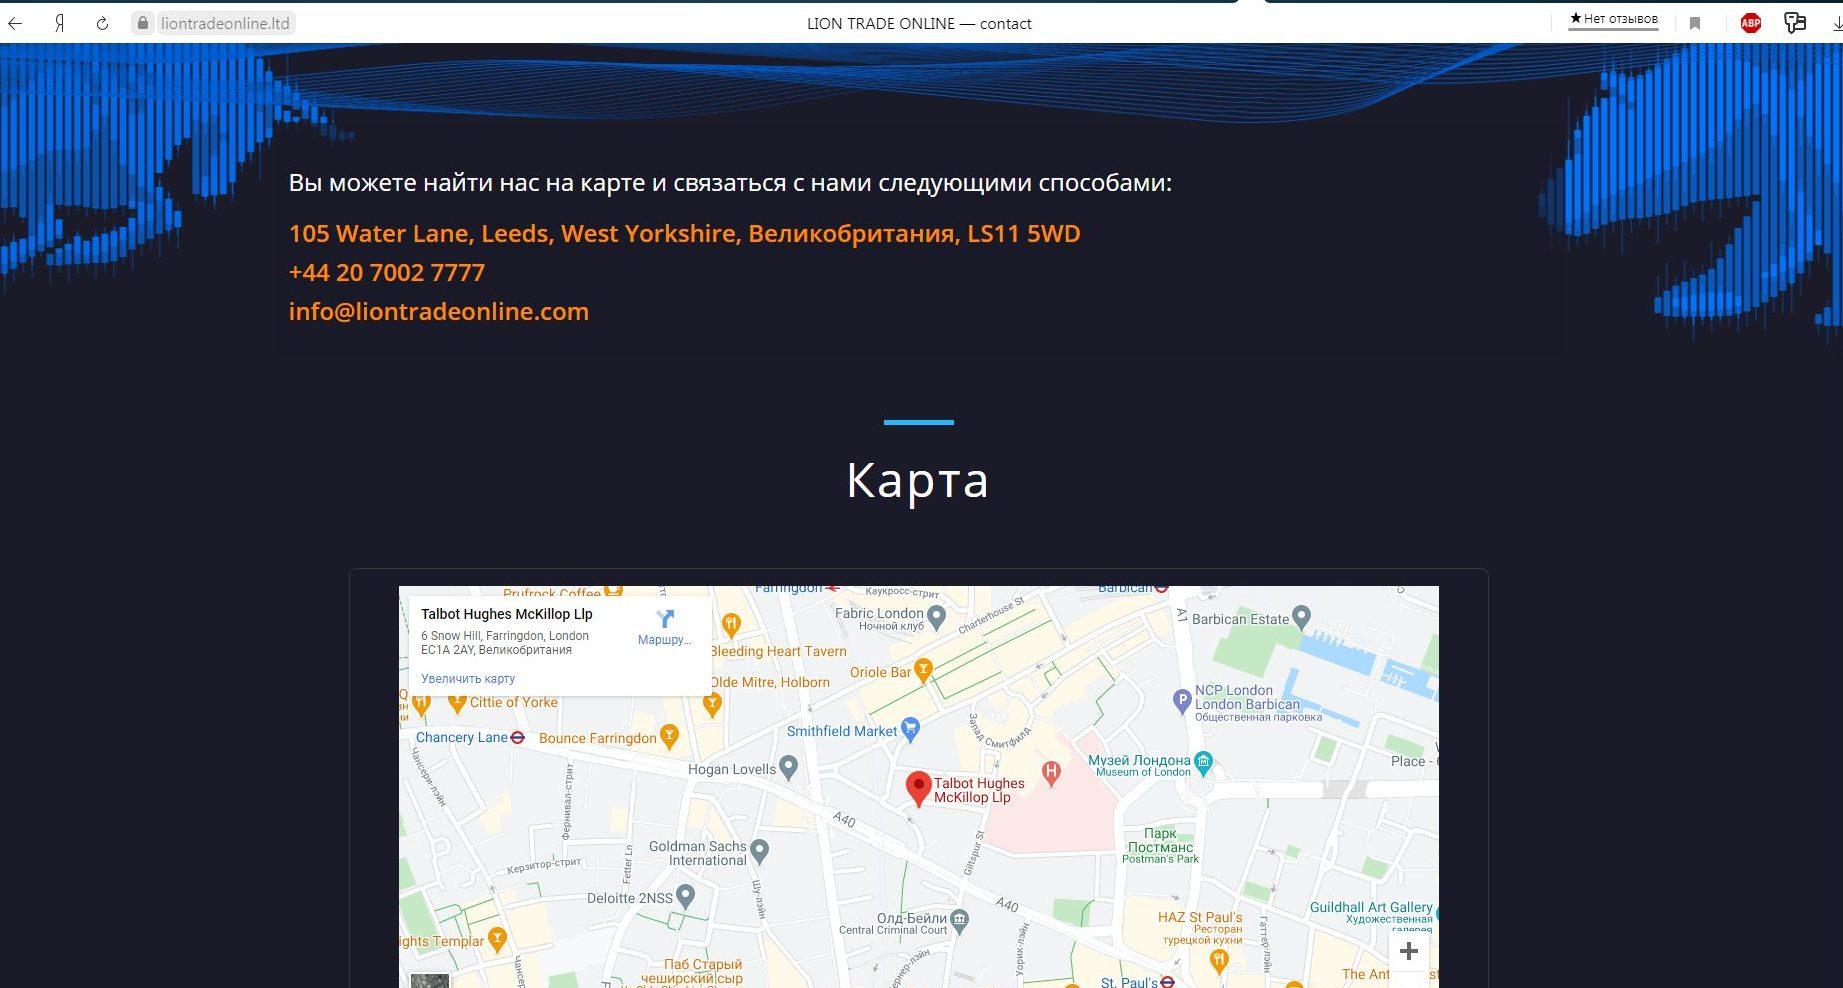 Фирму Lion Trade Online можно найти на карте